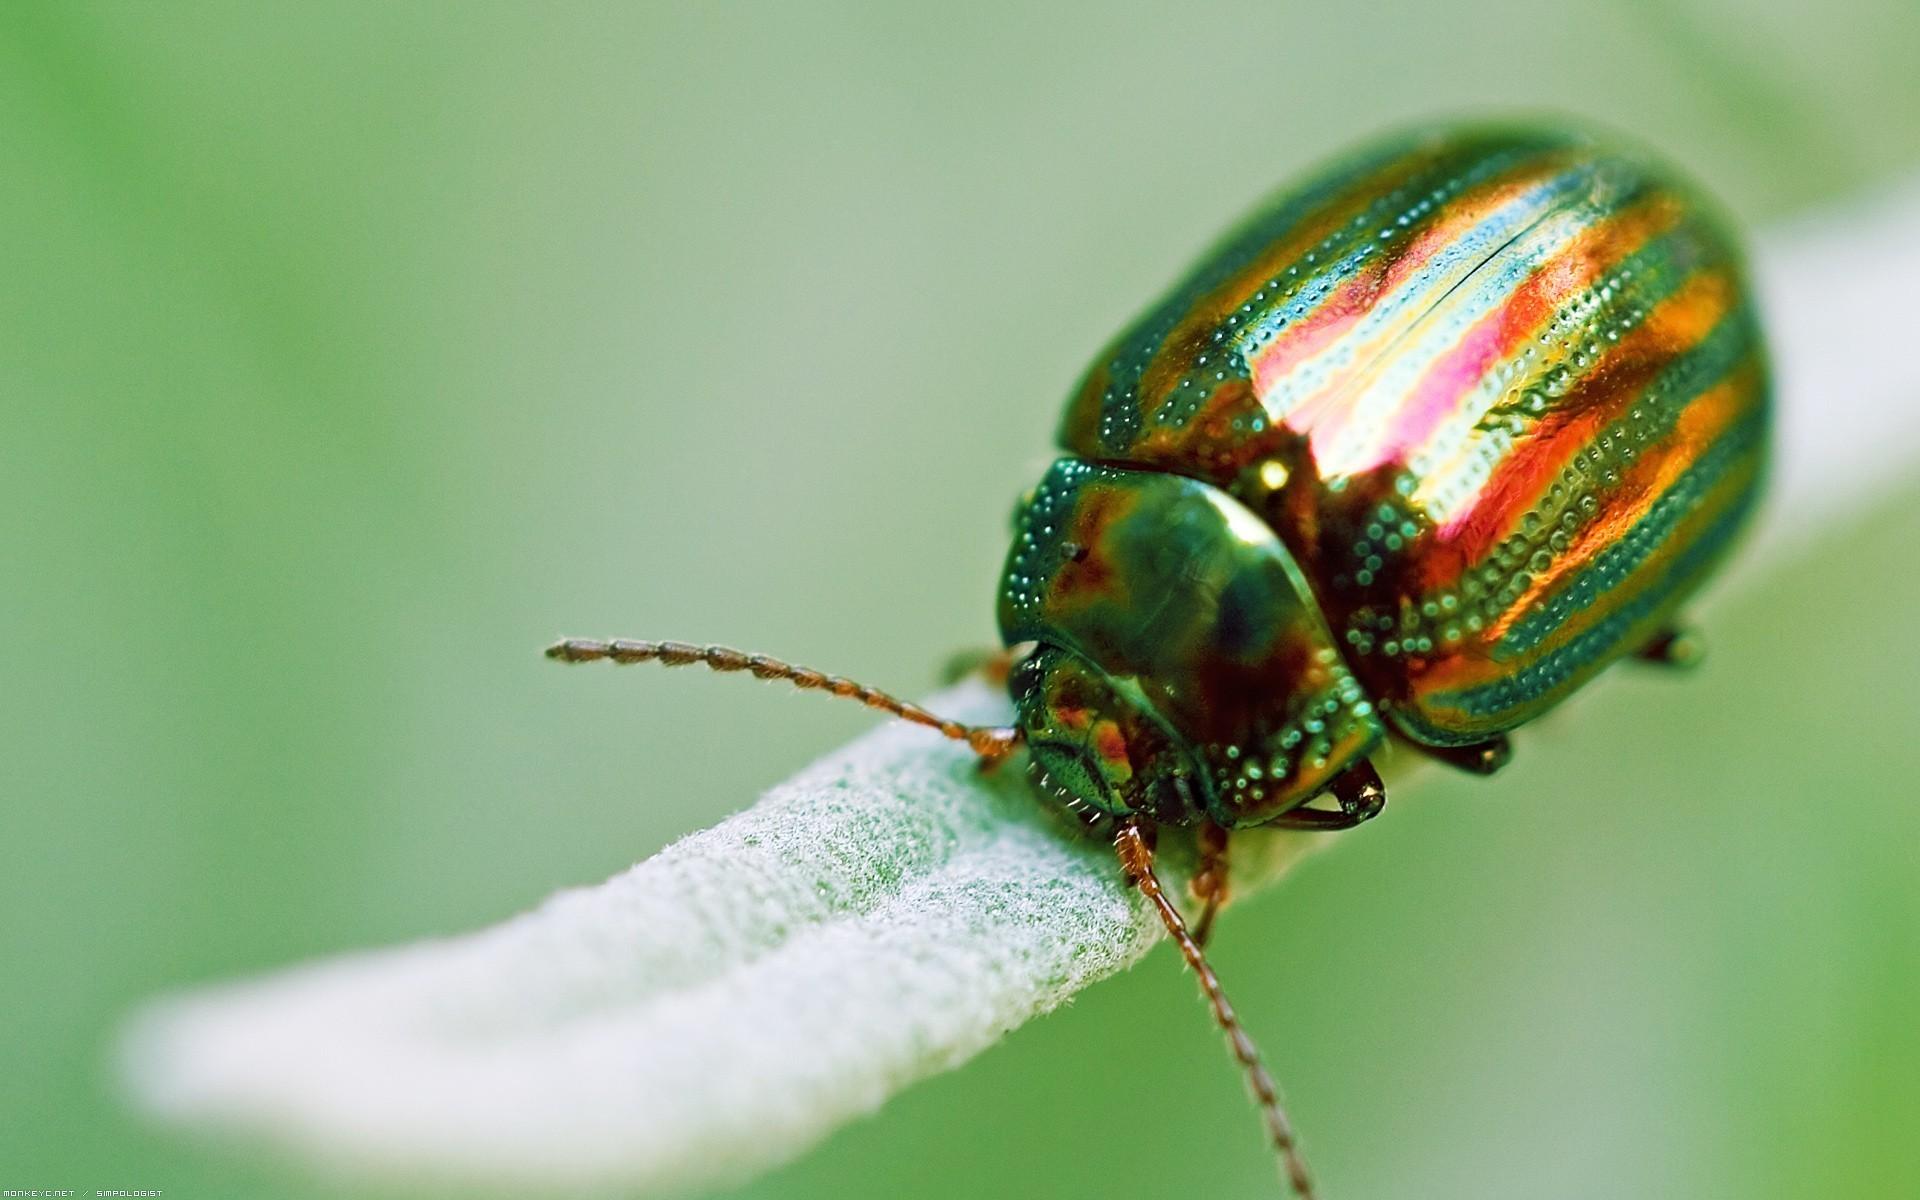 Res: 1920x1200, Bild: Faszinierende Bug wallpapers and stock photos. Â«